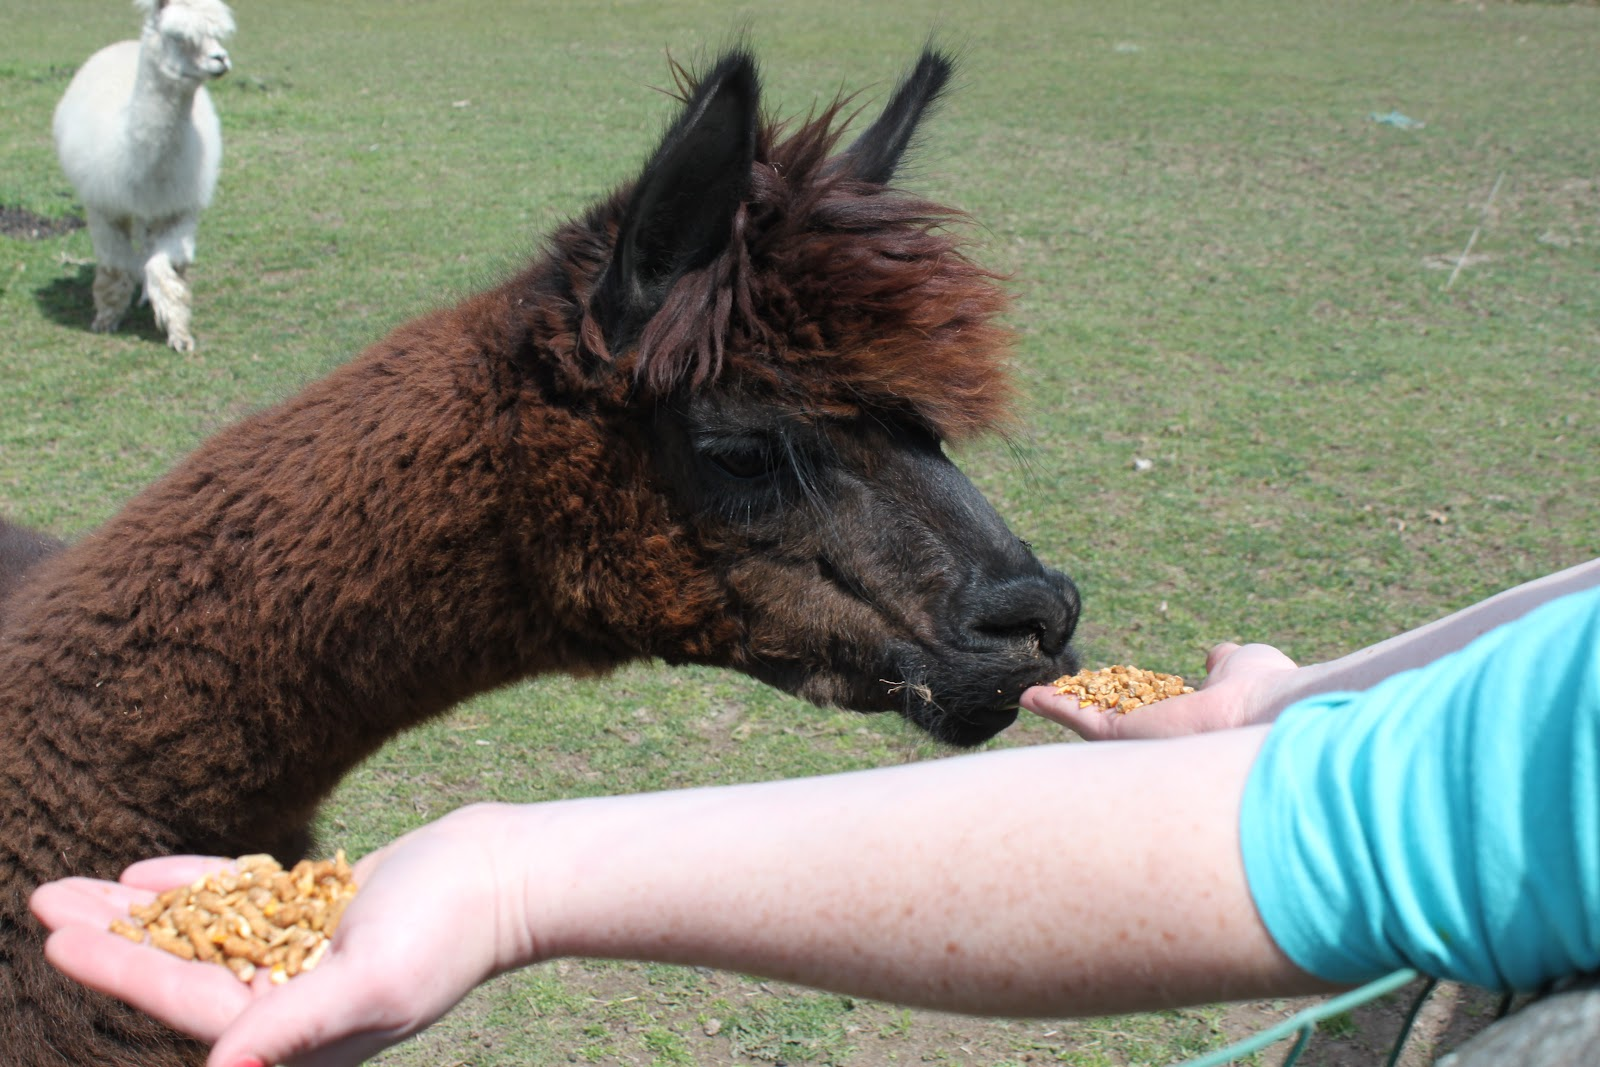 meals i have eaten alpacas we salute you